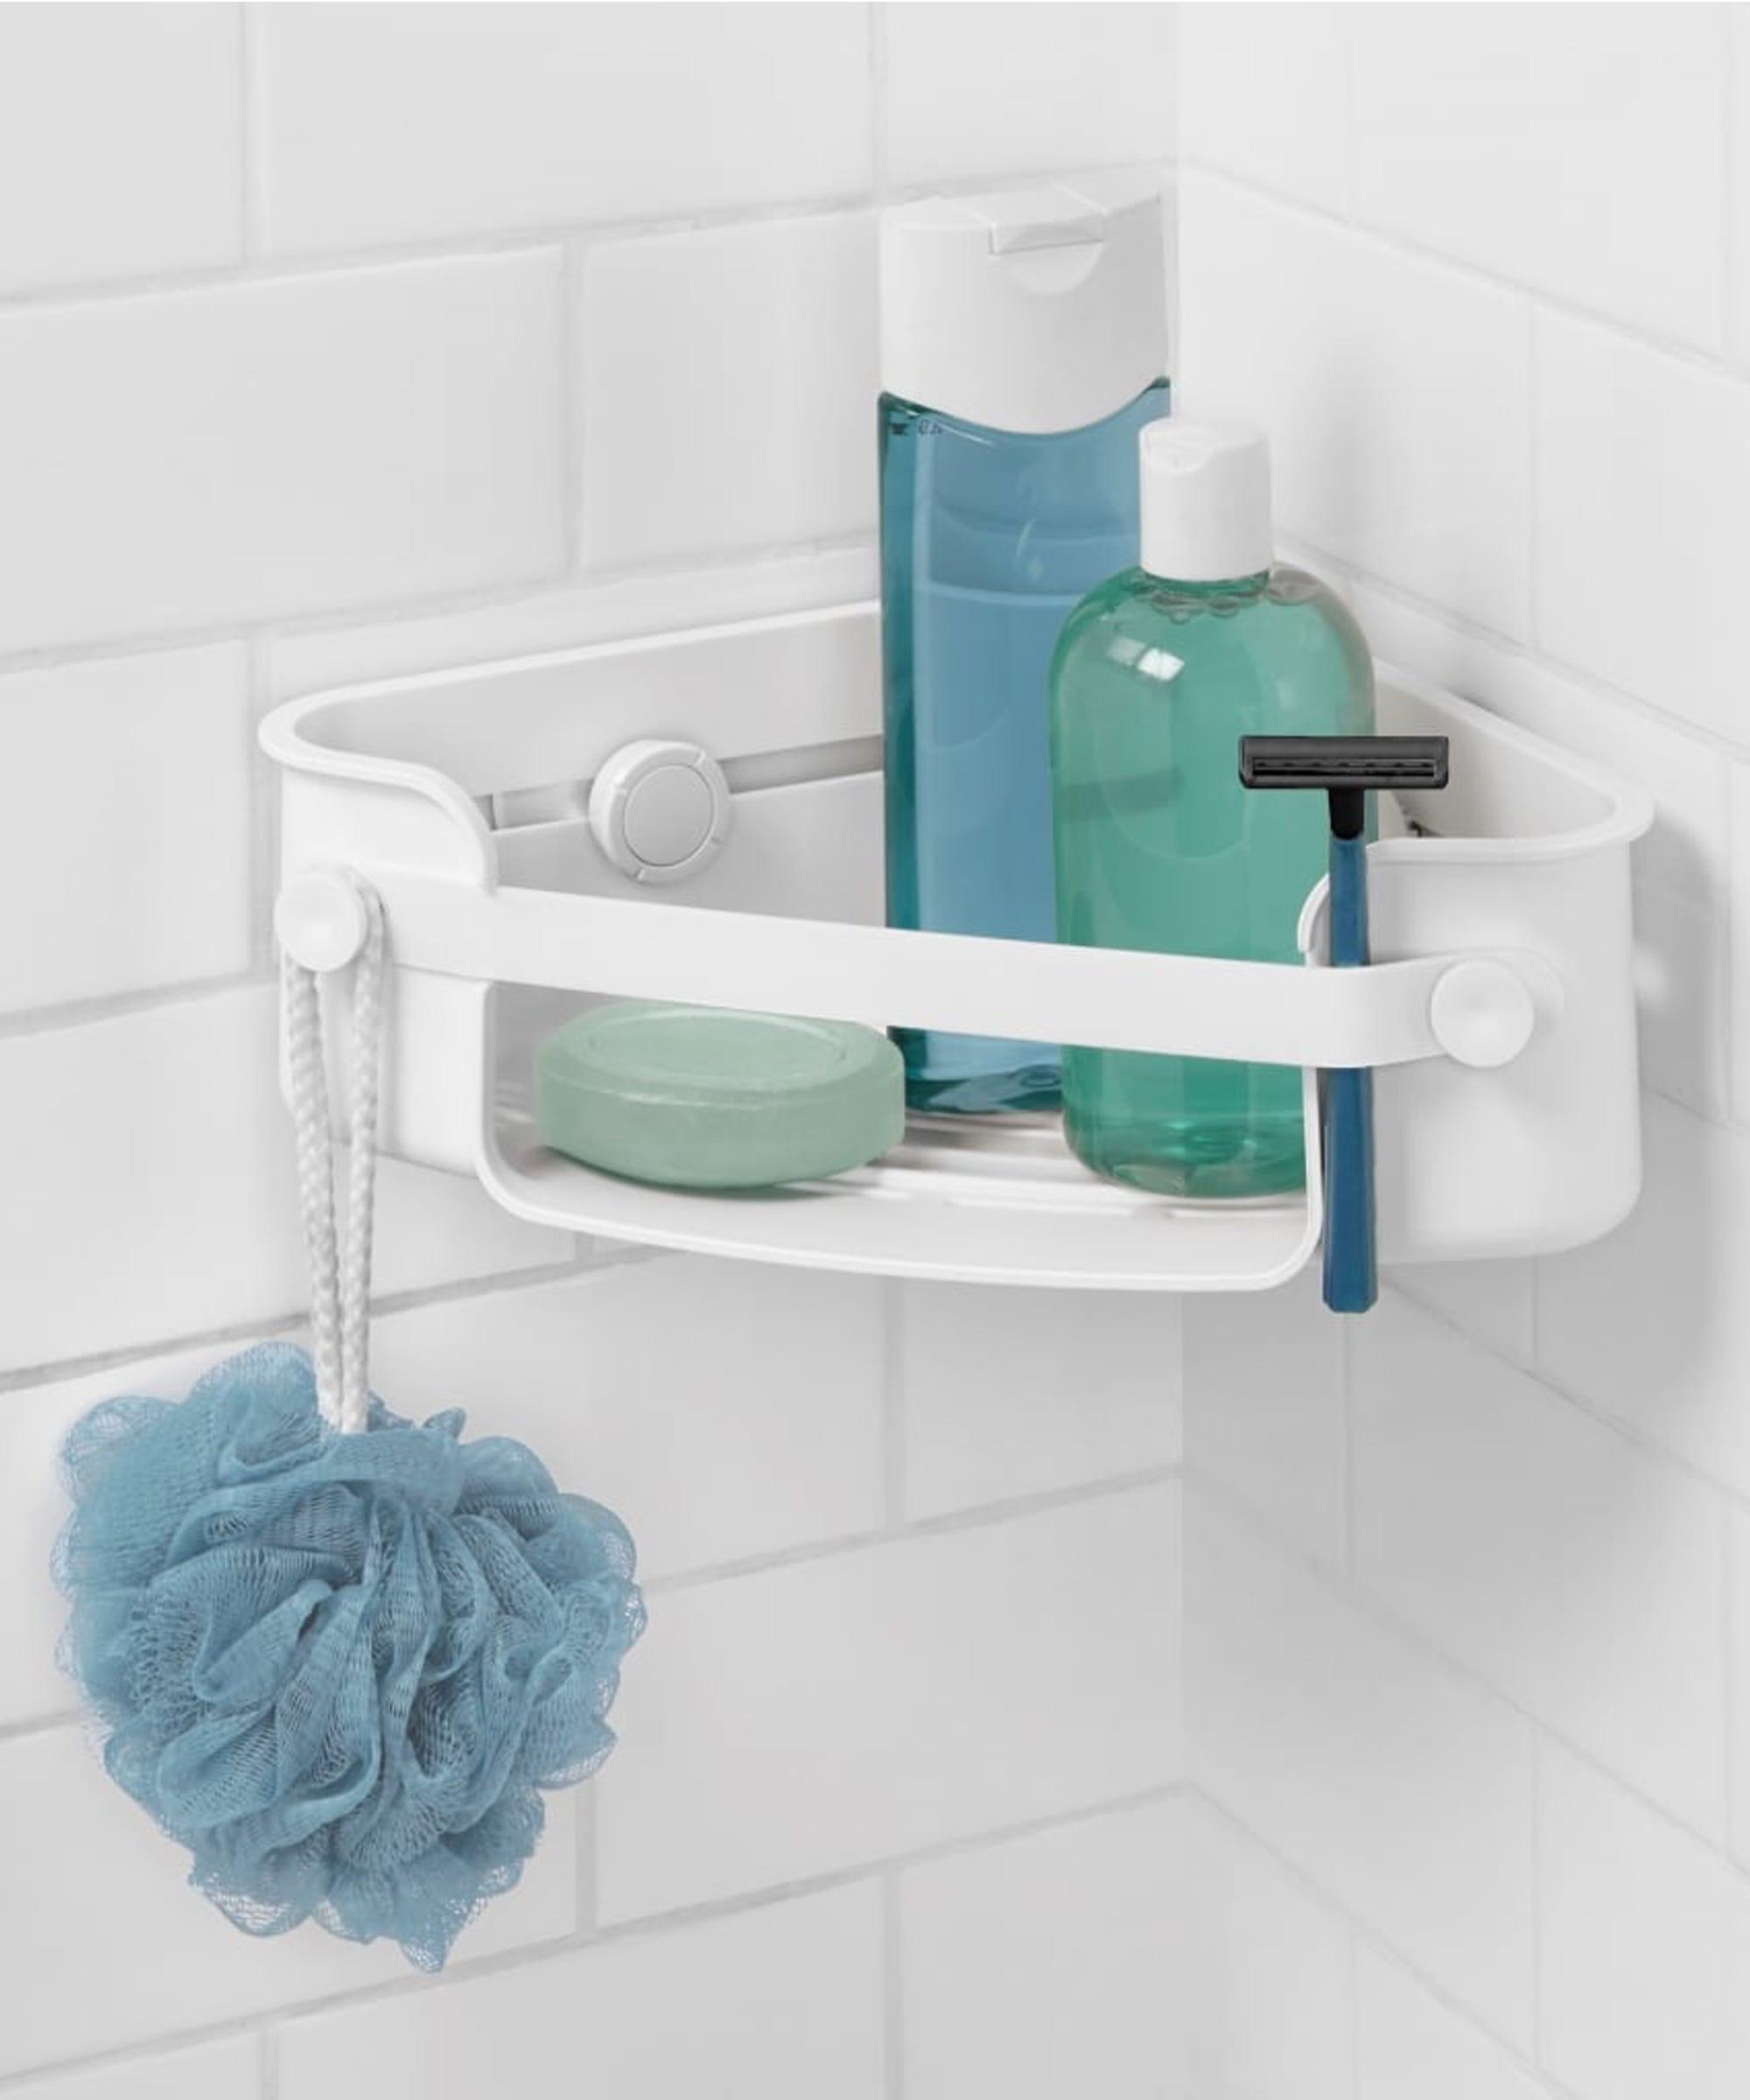 Small Bathroom Ideas For Your Tiny Flat